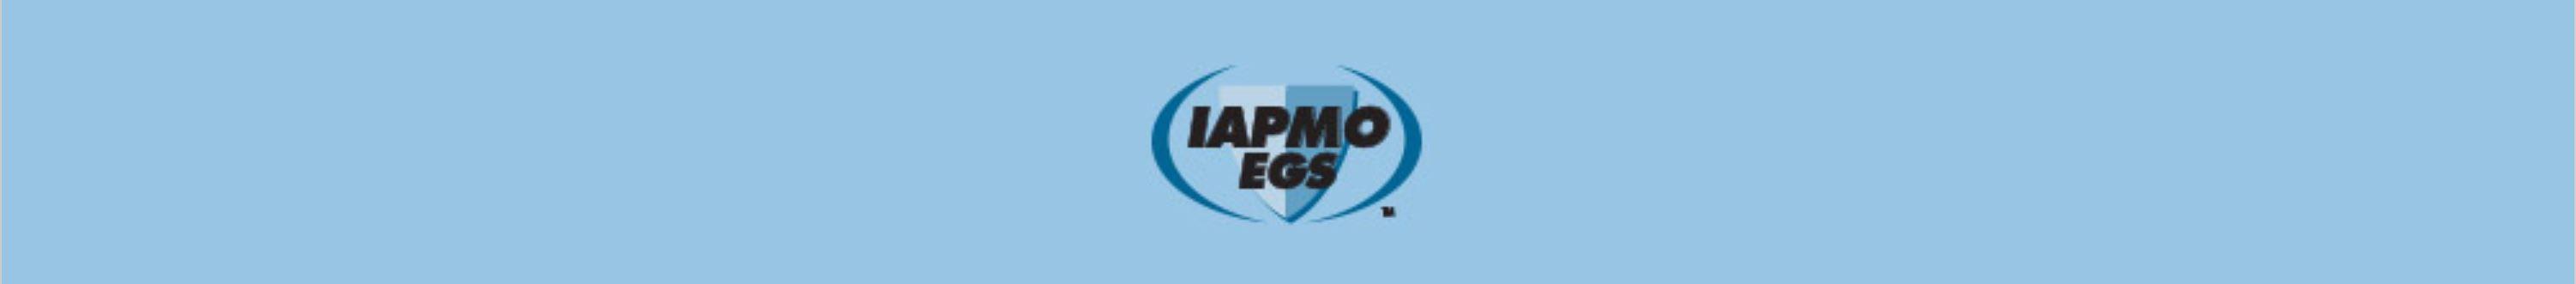 http://forms.iapmo.org/egsw/display.aspx?file=E10068